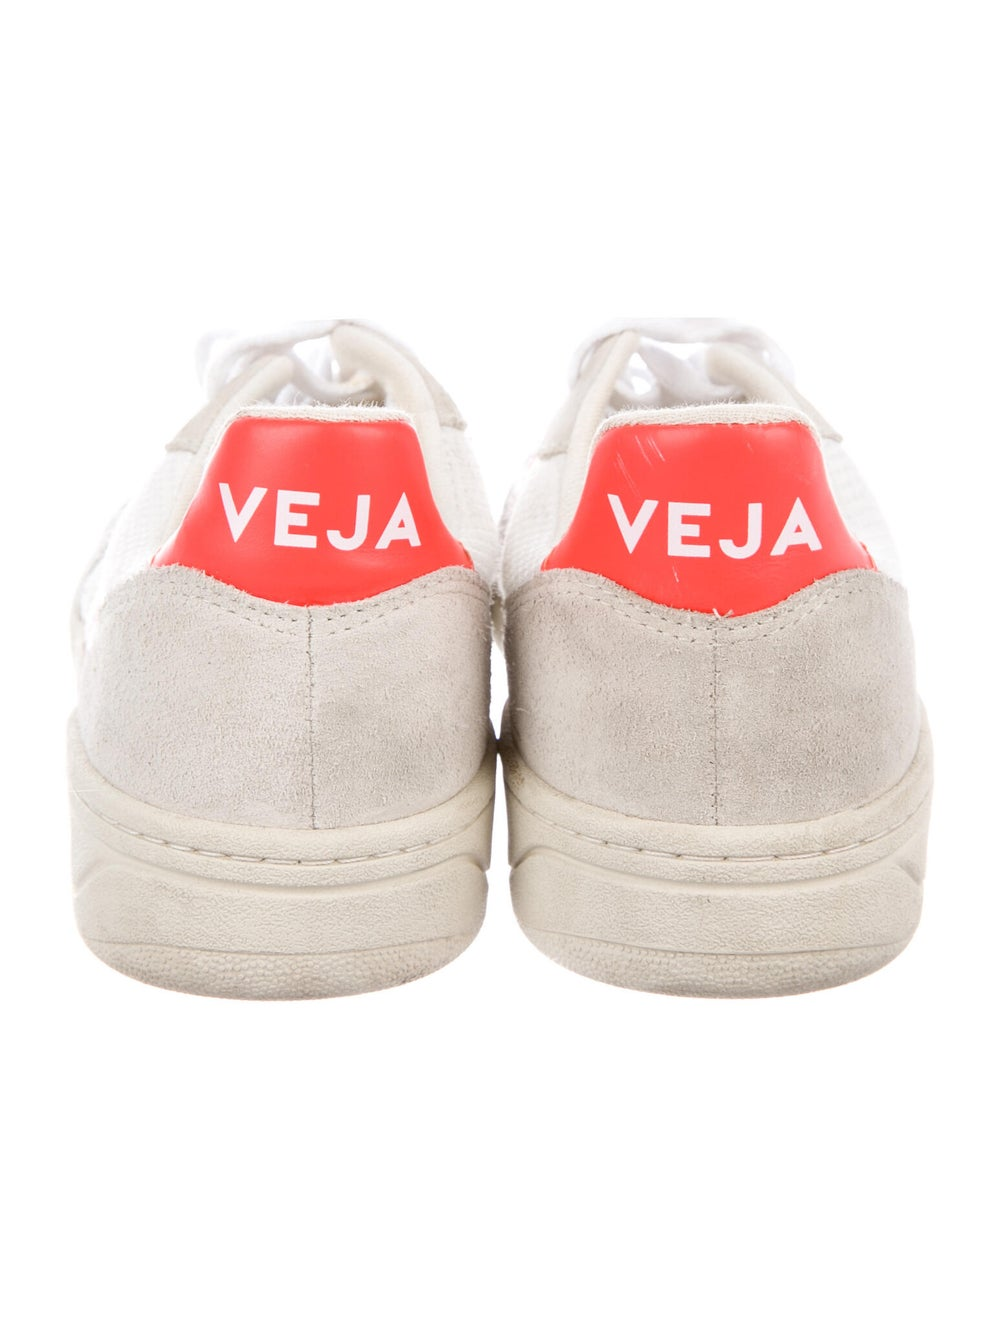 Veja Graphic Print Sneakers - image 4